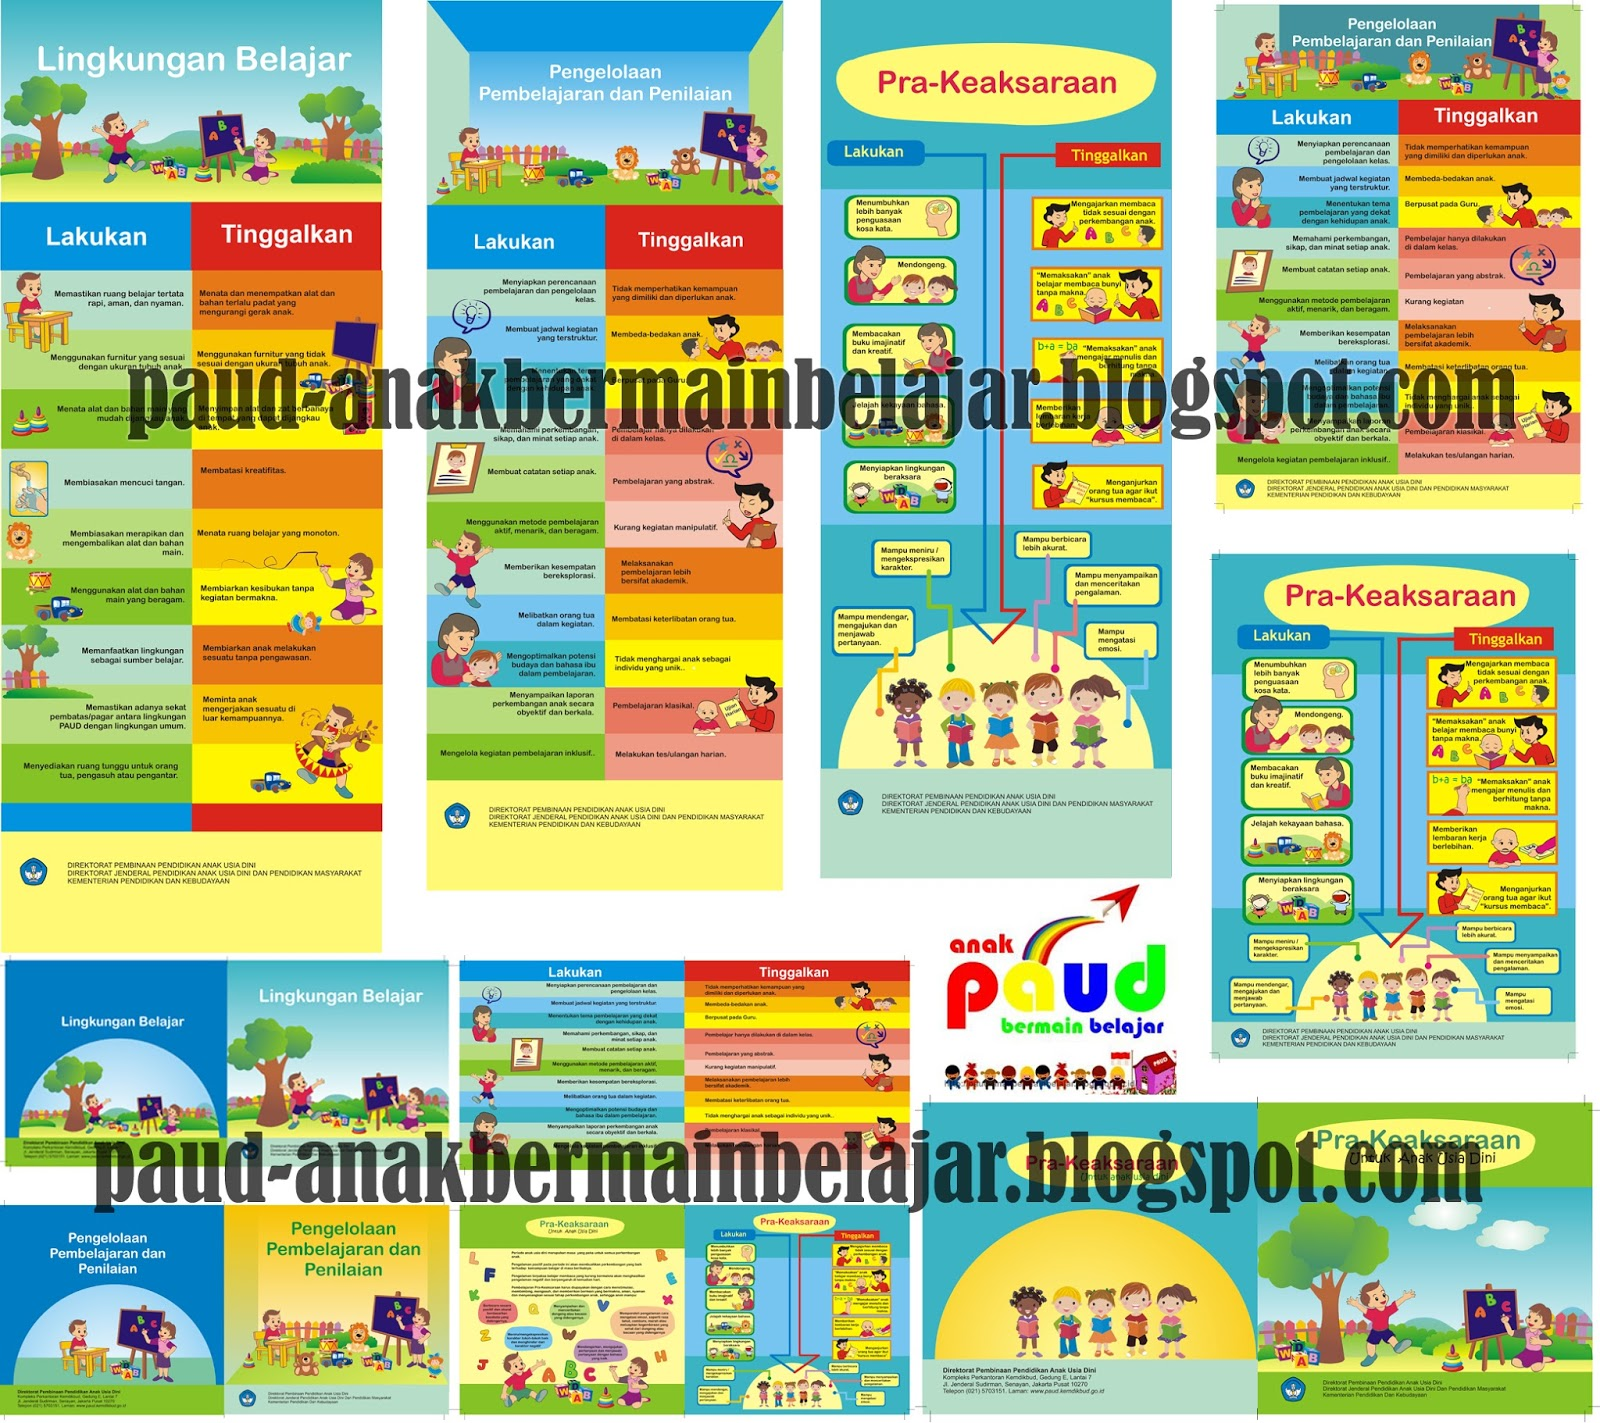 Contoh Komitmen Siswa Pengertian Komitmen Guru Profesional Ahmad Fauzan Poster Baner Booklet Kegiatan Paud Tk Anak Paud Bermain Belajar